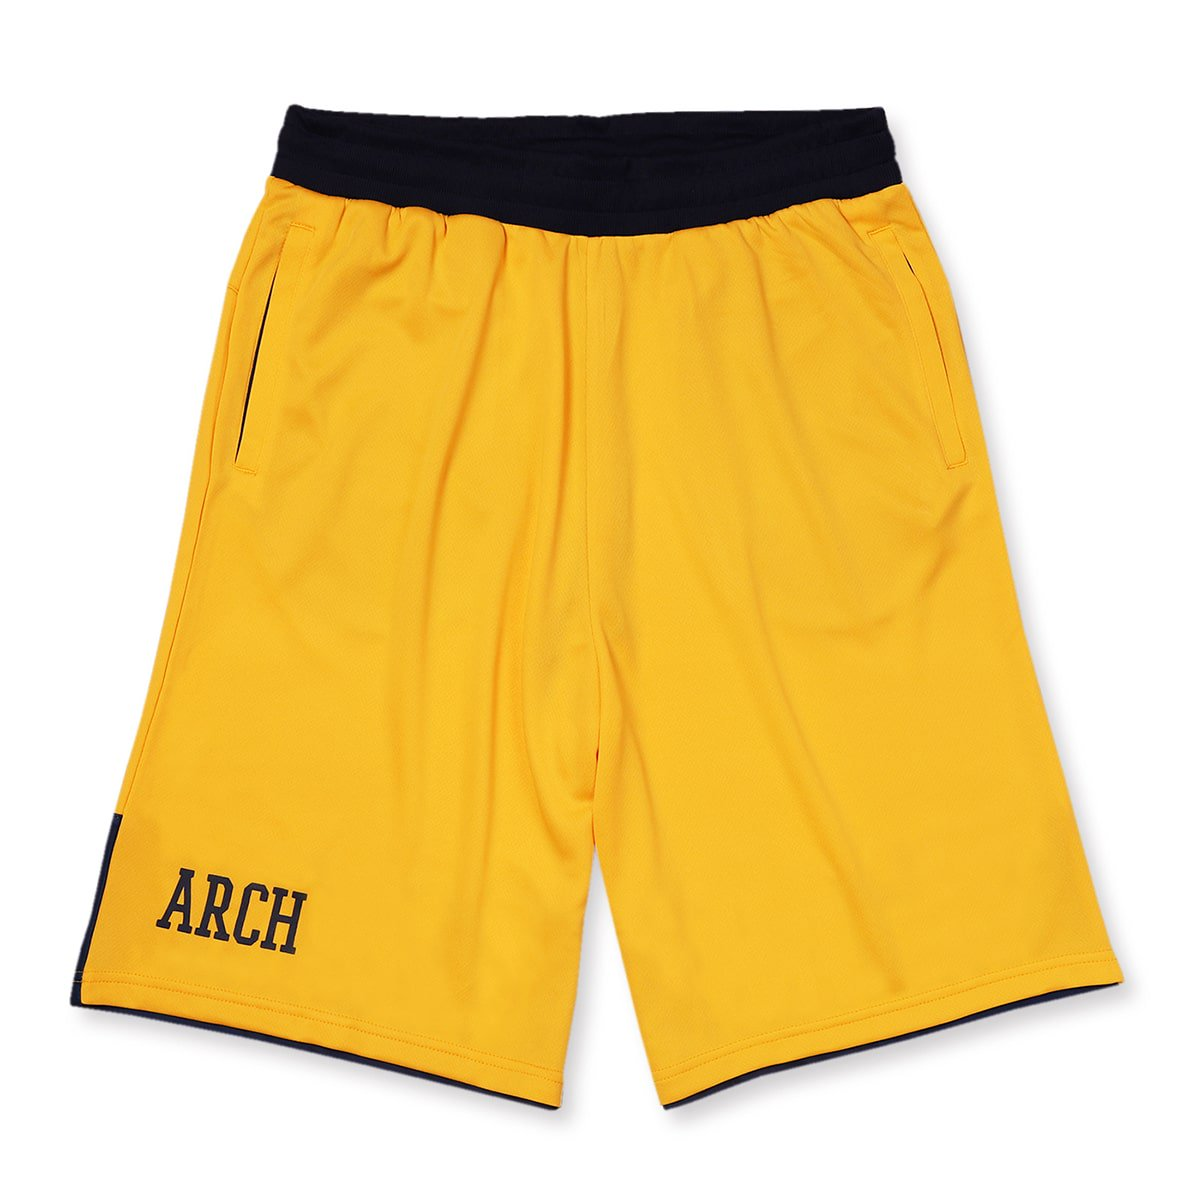 bi-color shorts【yellow/navy】